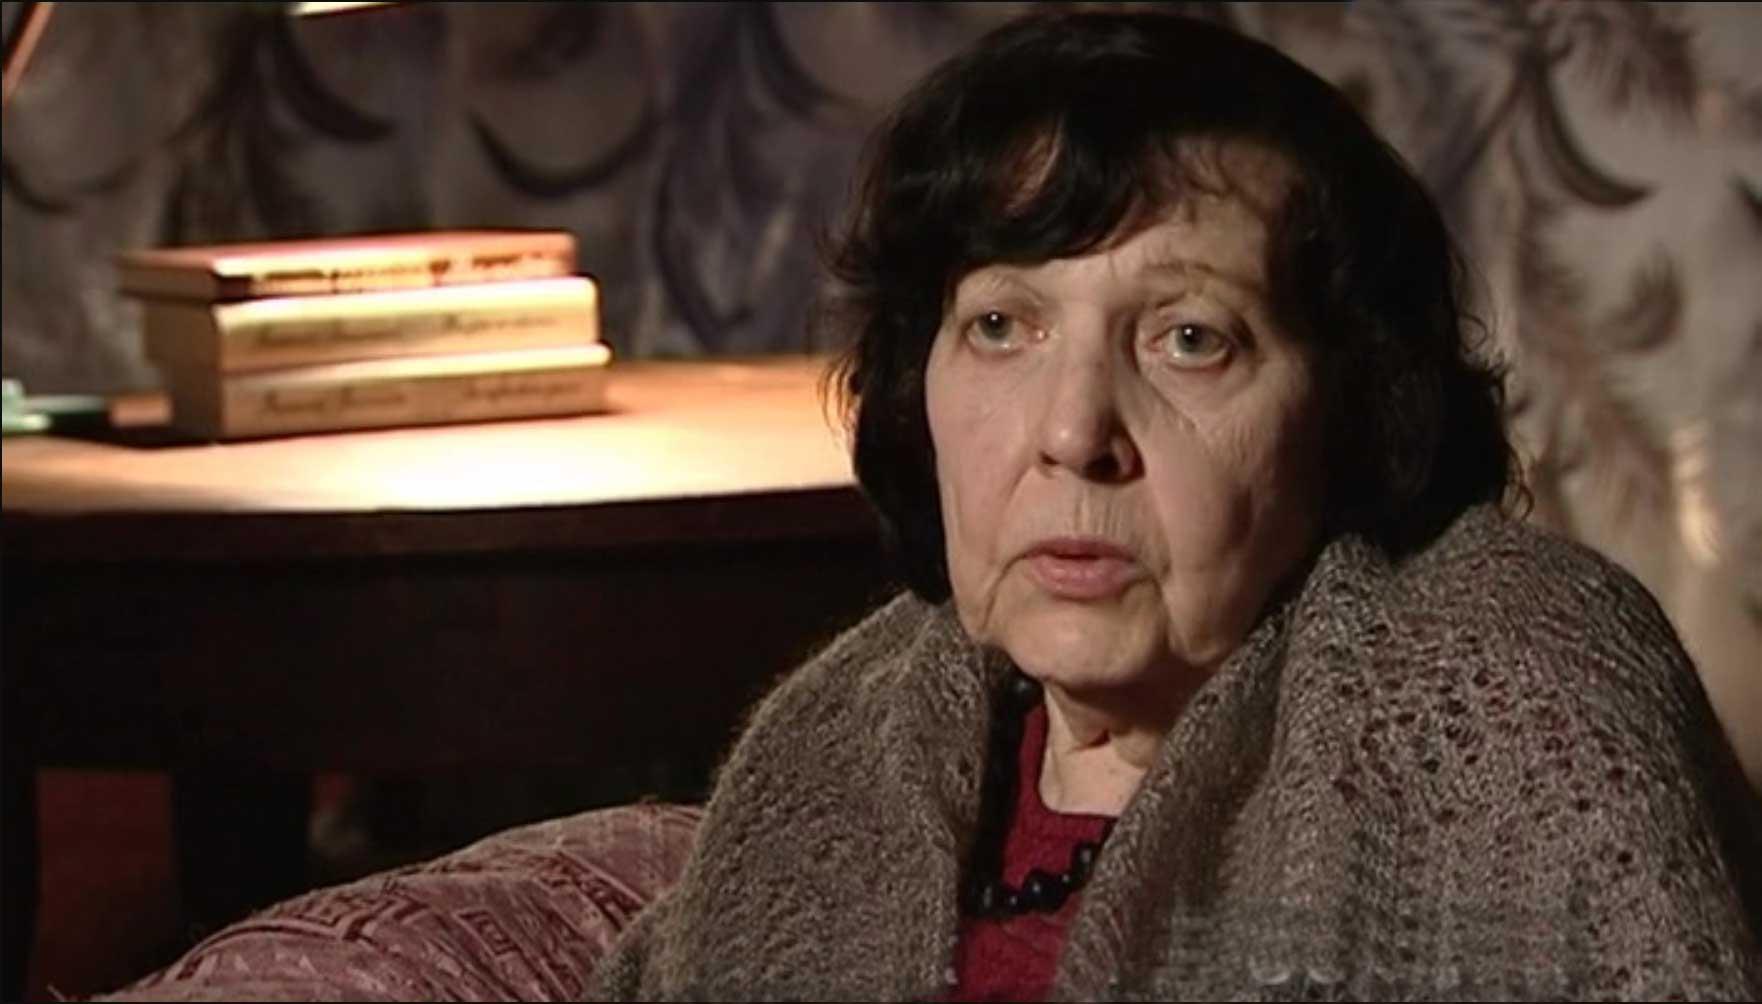 Ekaterina Korotkova Grossman (26/06/1930 – 9/10/2020)